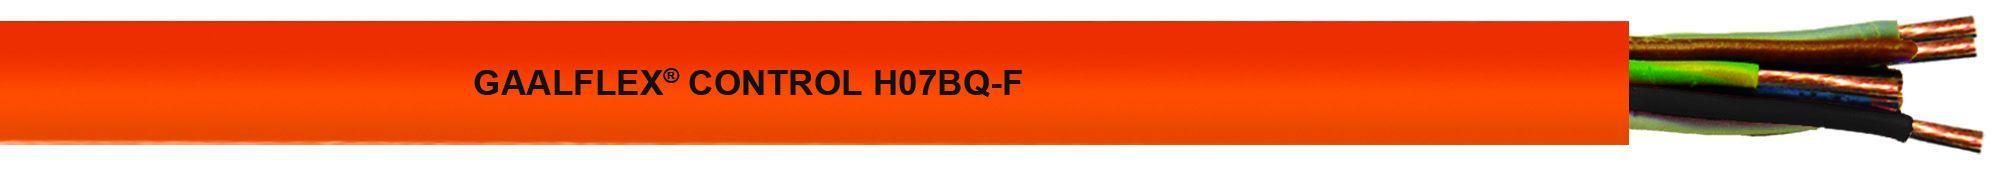 Elettrotek Kabel VietnamGAALFLEX CONTROL H07BQ-F